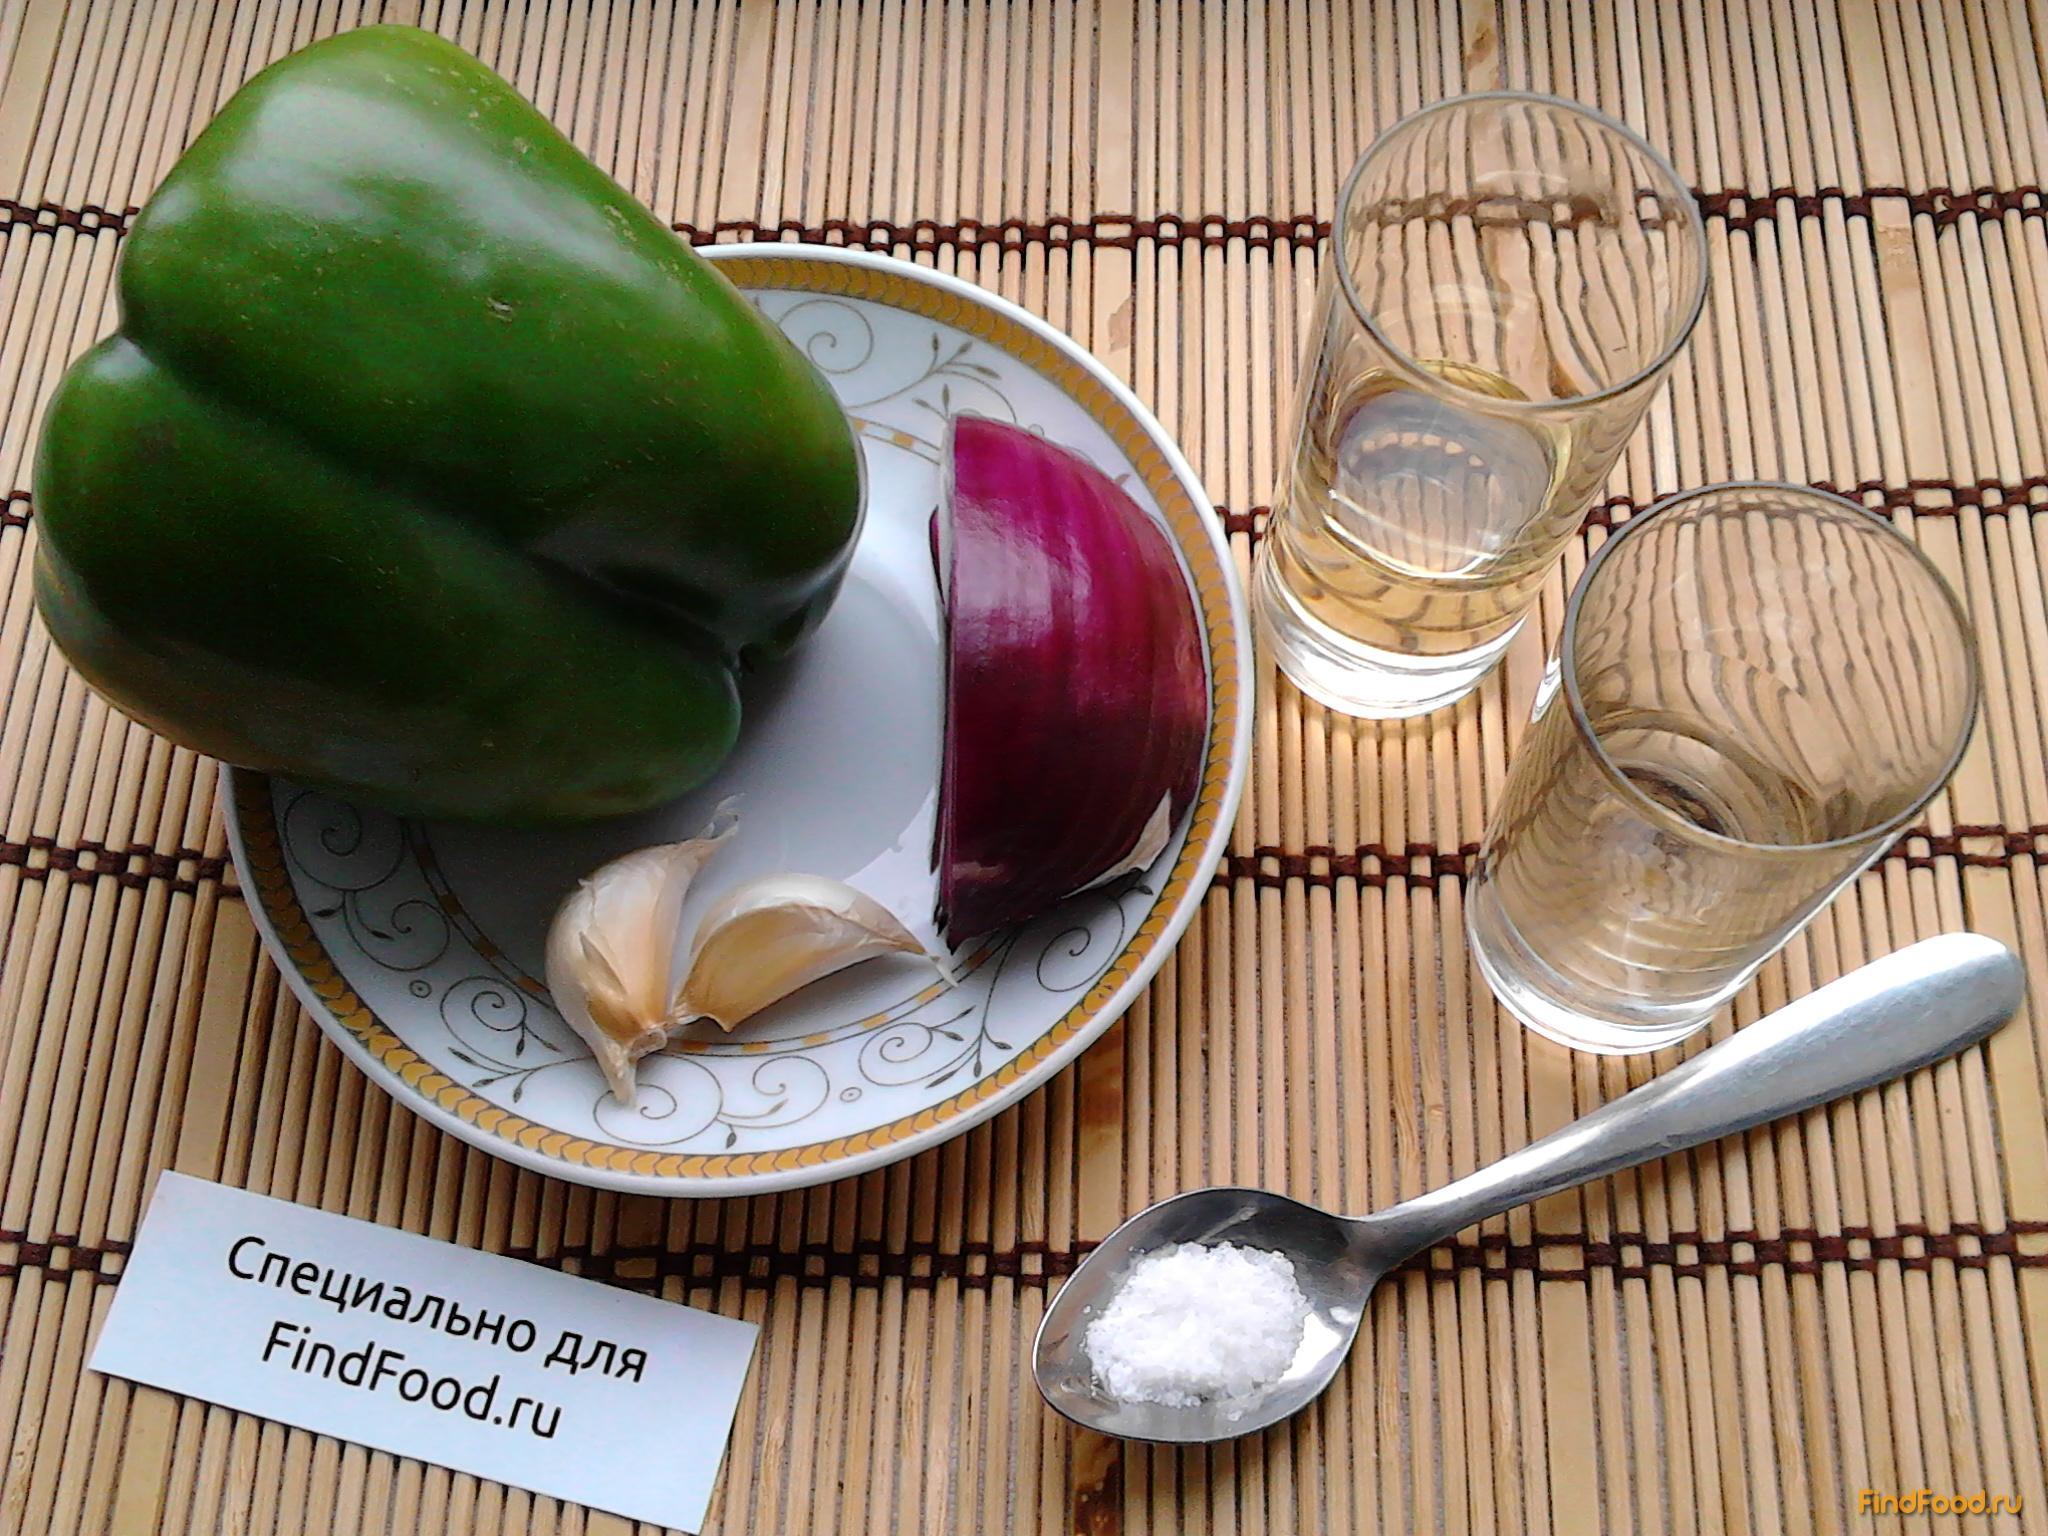 Салат из болгарского перца с луком рецепт с фото 1-го шага